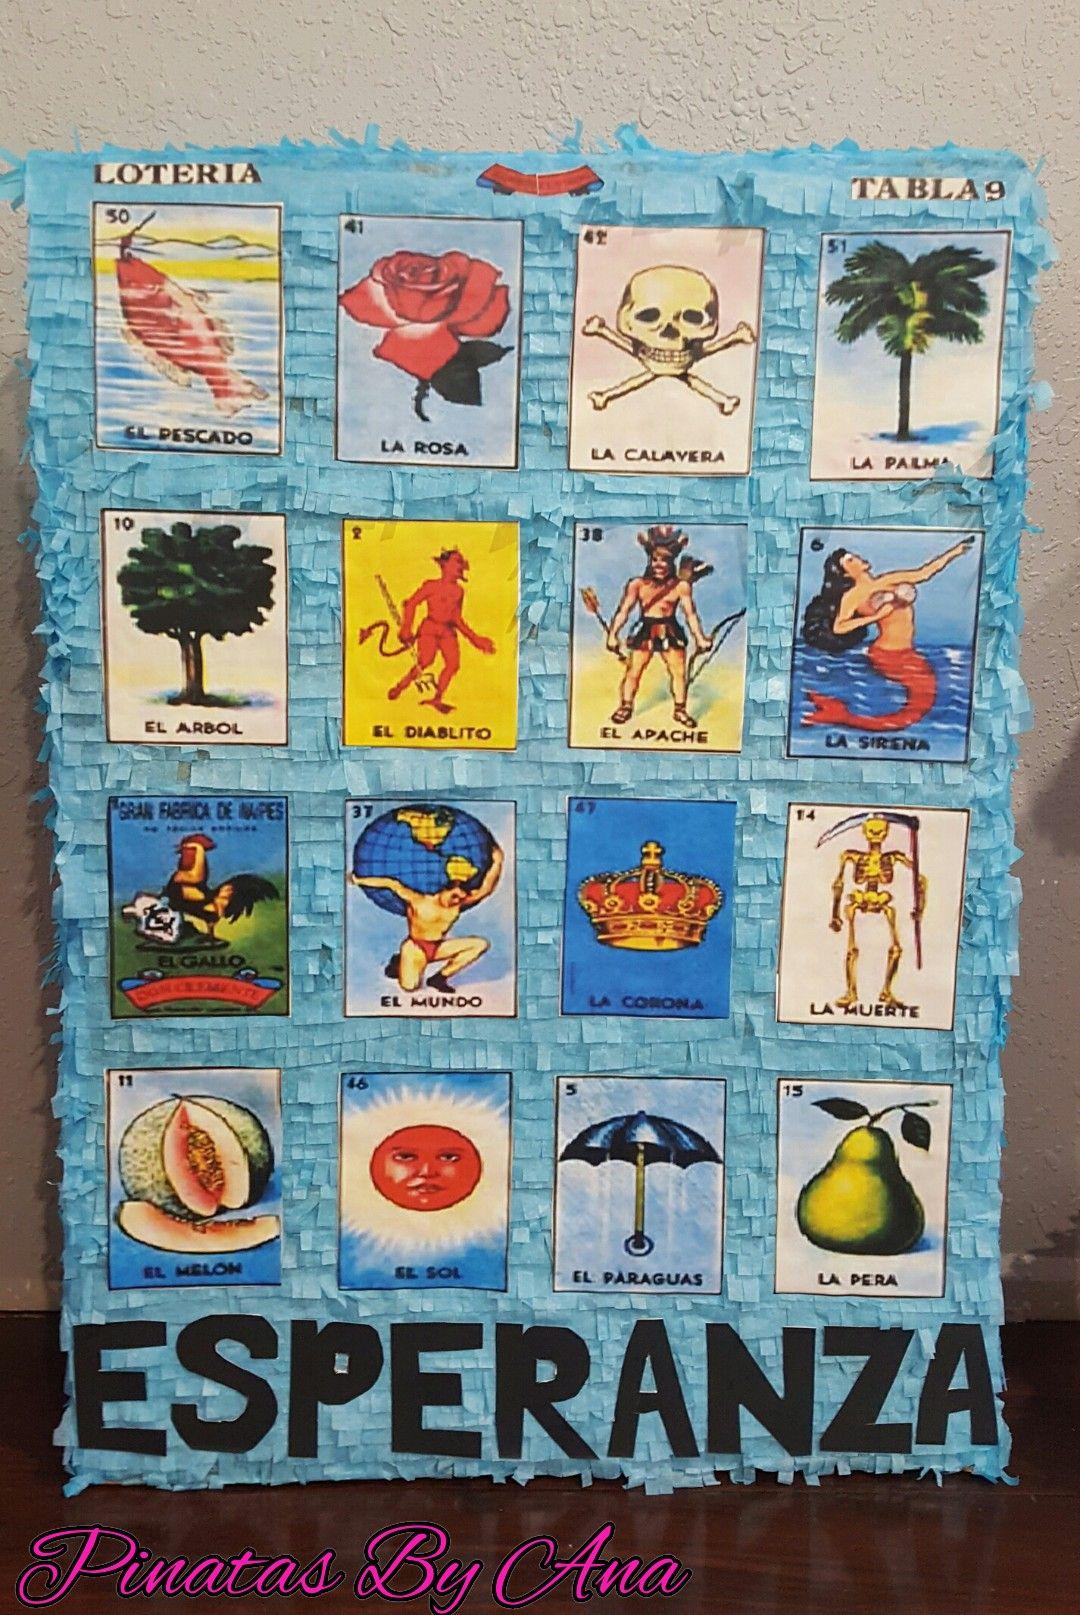 photograph relating to Free Printable Mexican Loteria Cards known as Loteria celebration Loteria card pinata Mexican bash Piñatas via